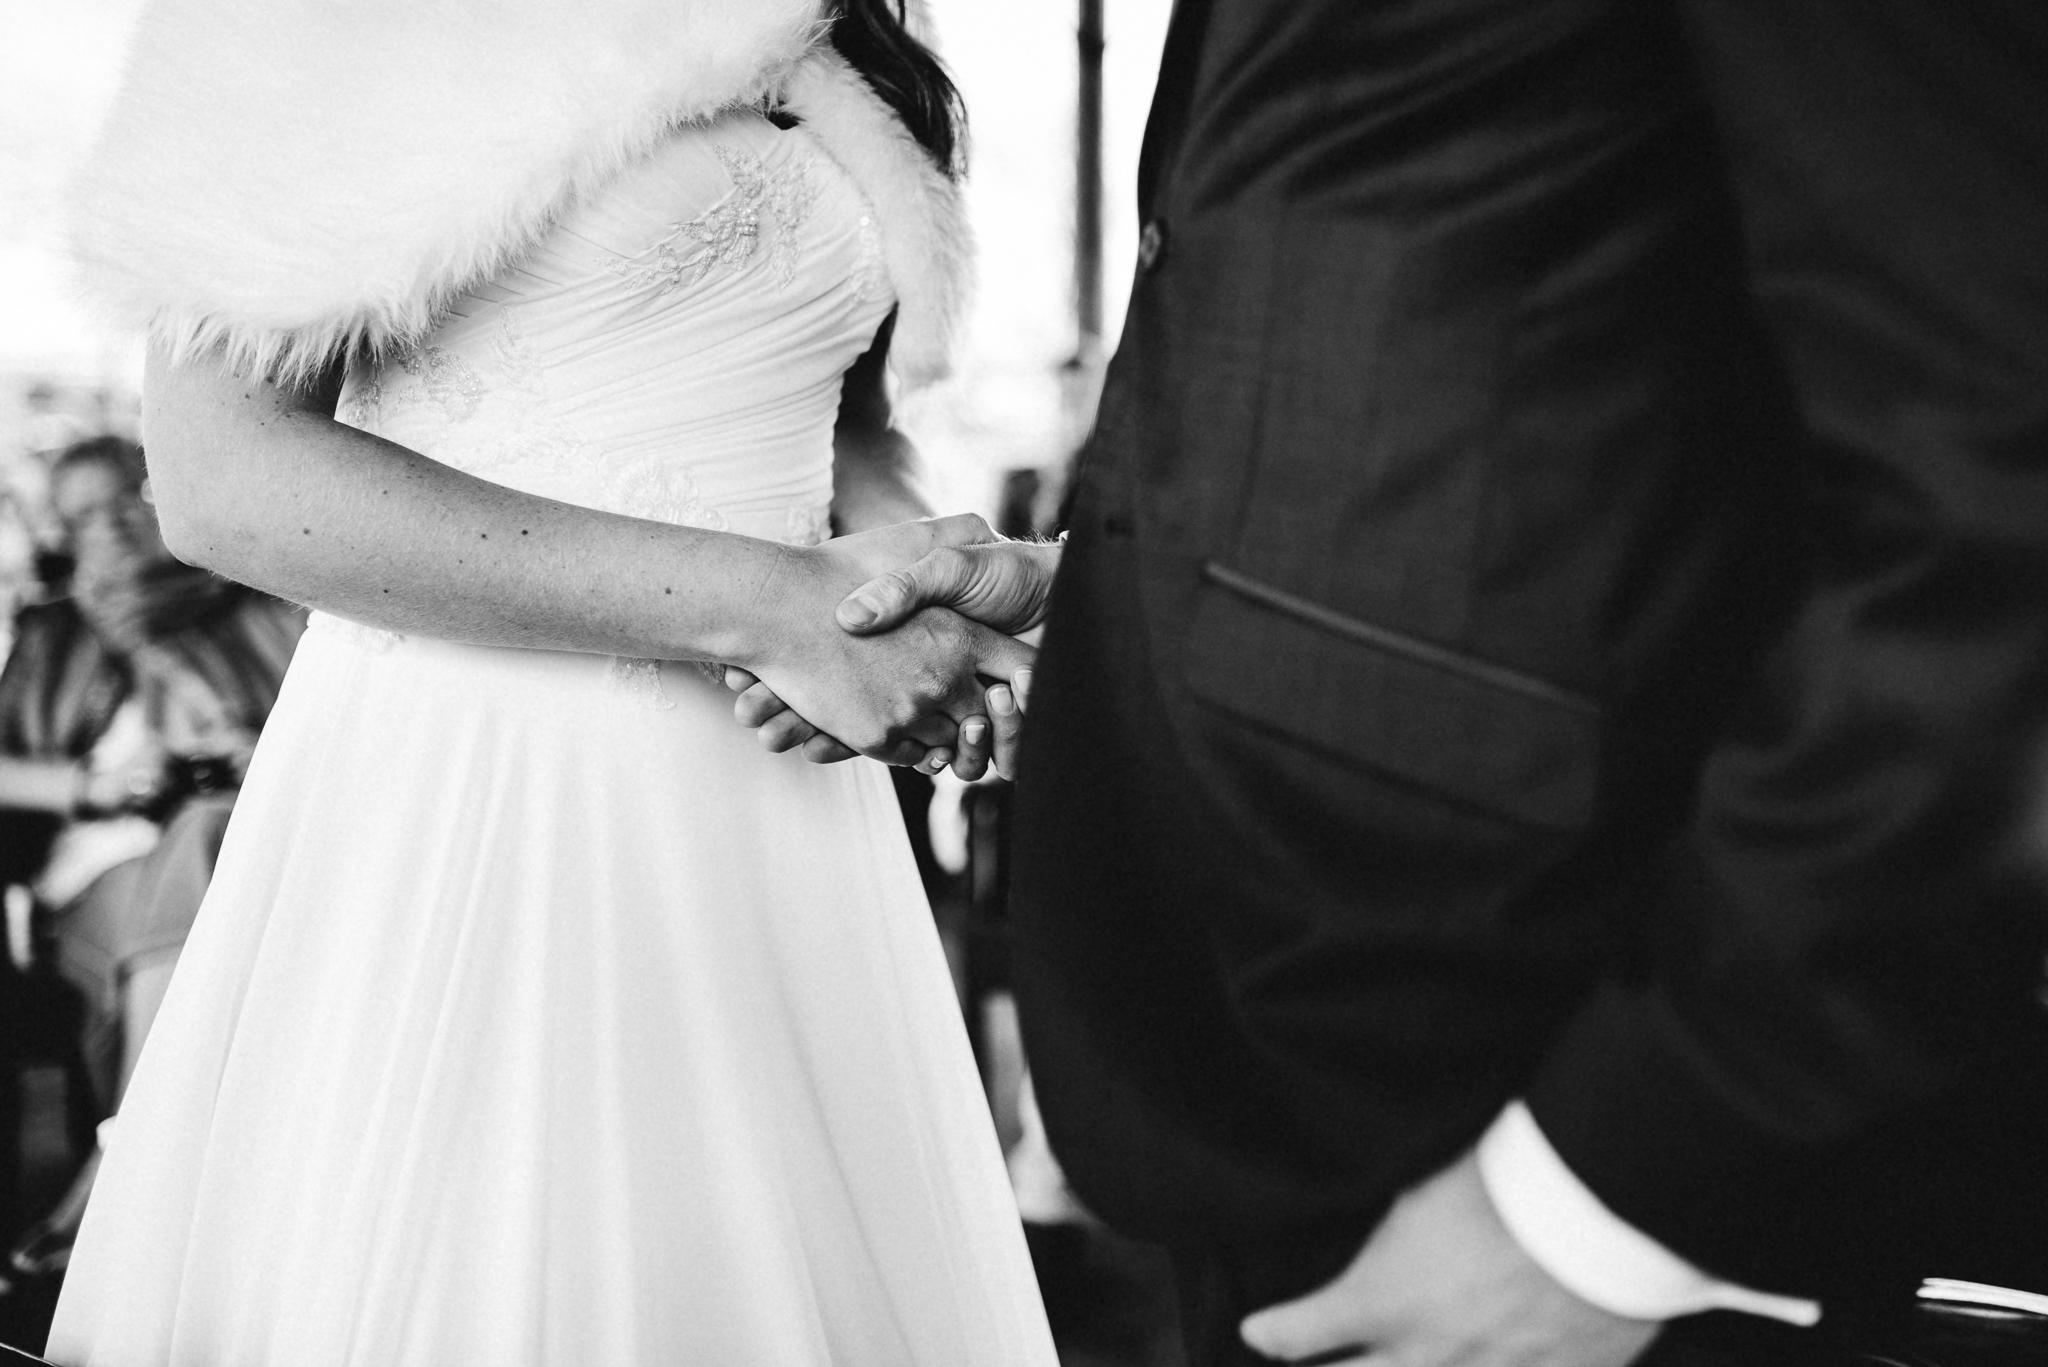 31 van 51 - trouwfotografie-gelske-reinier-friesland - 2464